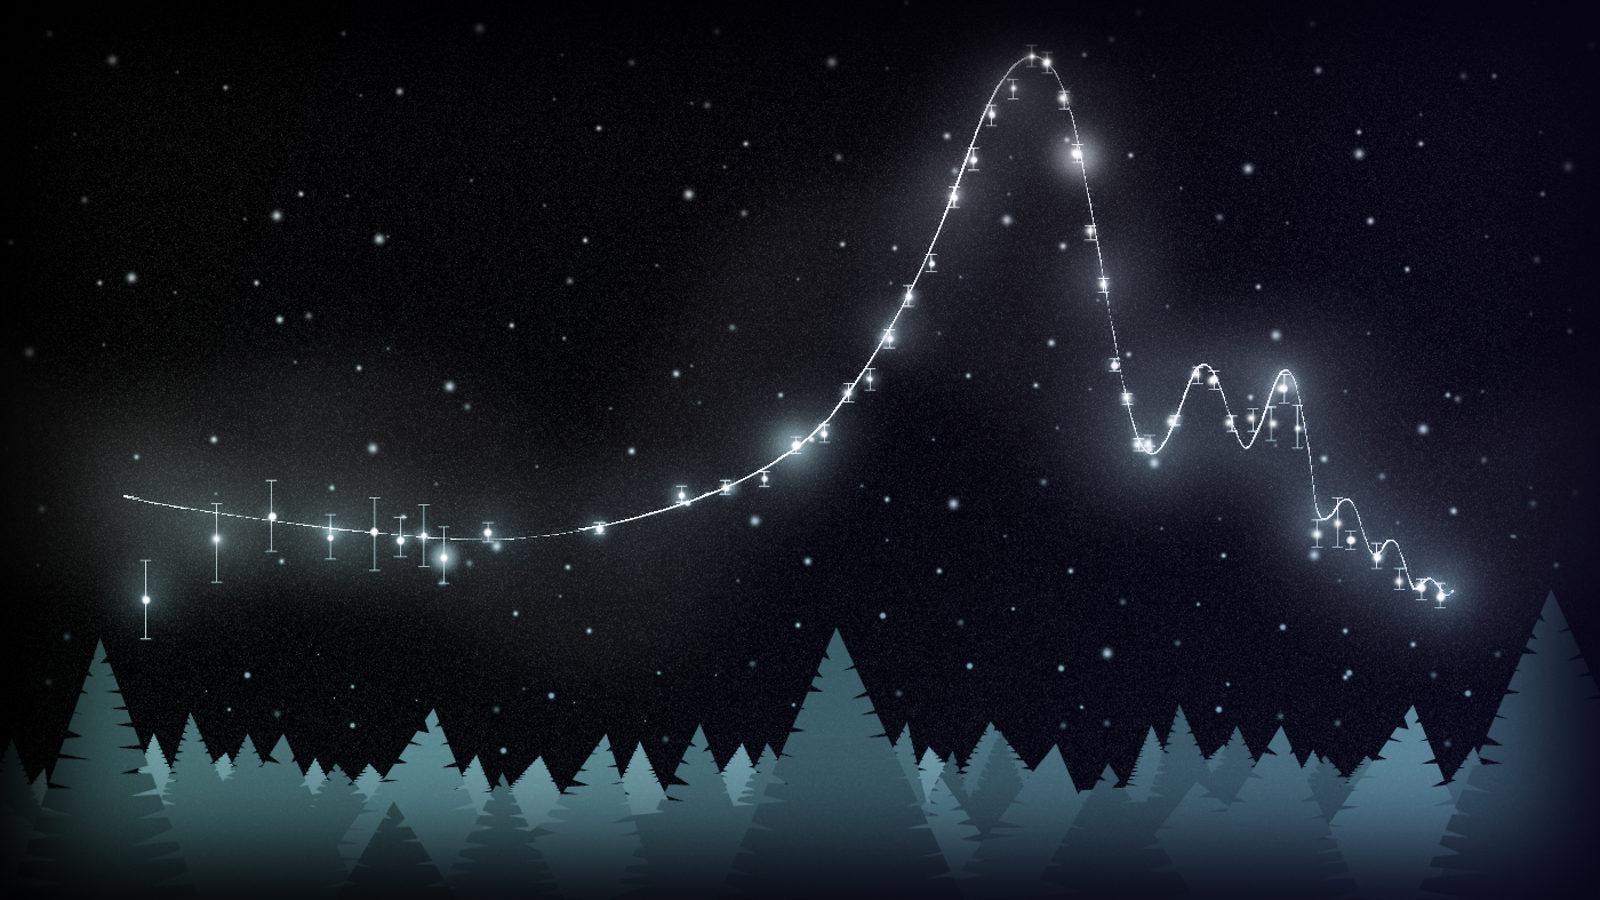 Image: Astrostatistics